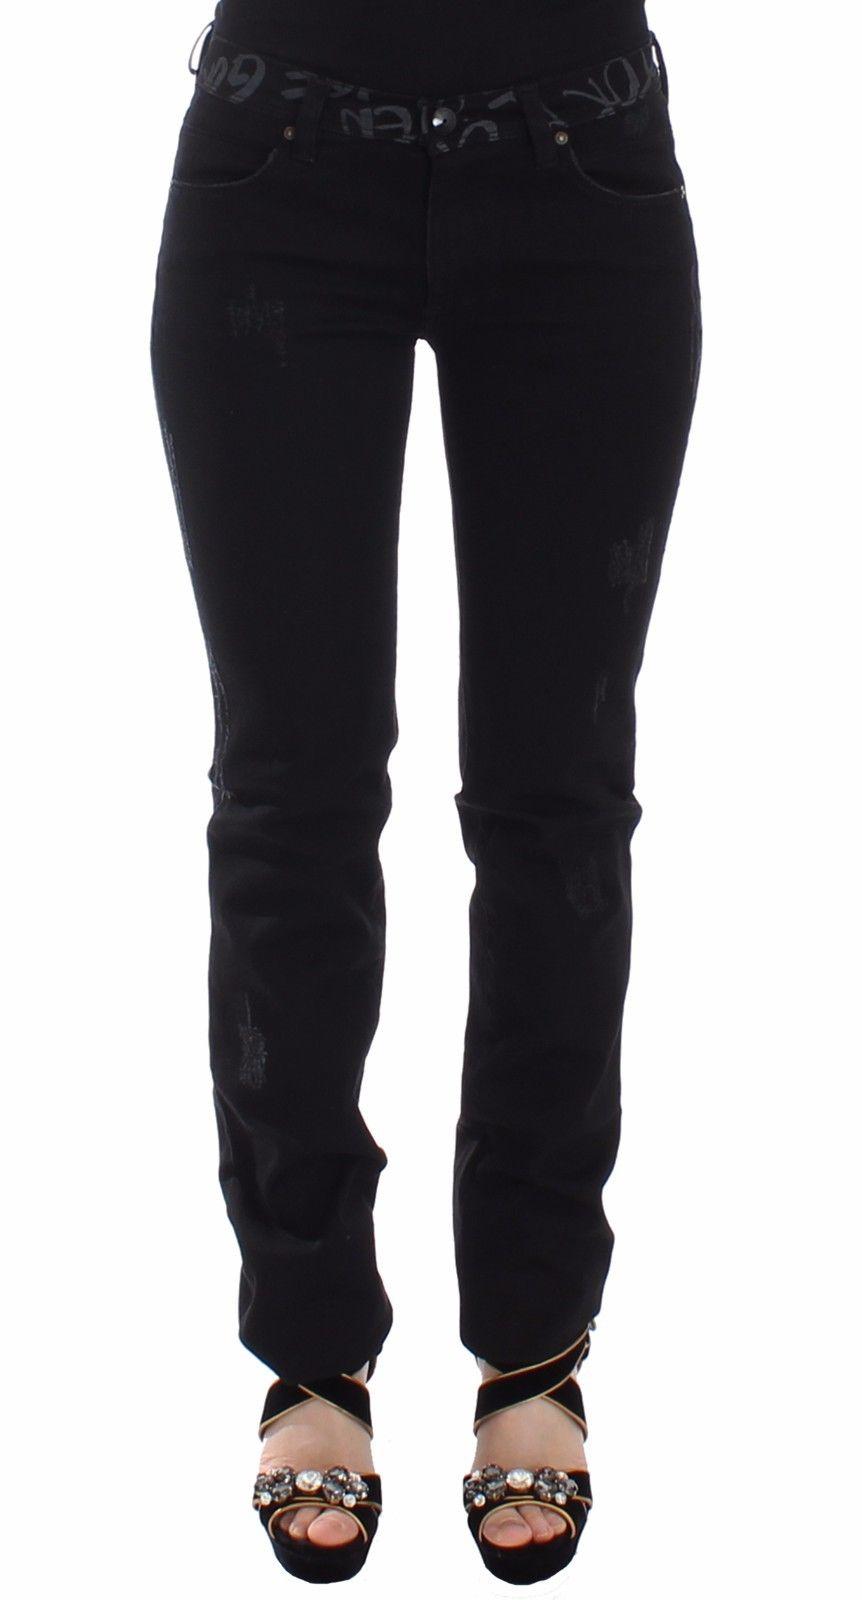 Ermanno Scervino Women's Slim Fit Jeans Black SIG12690 - IT40